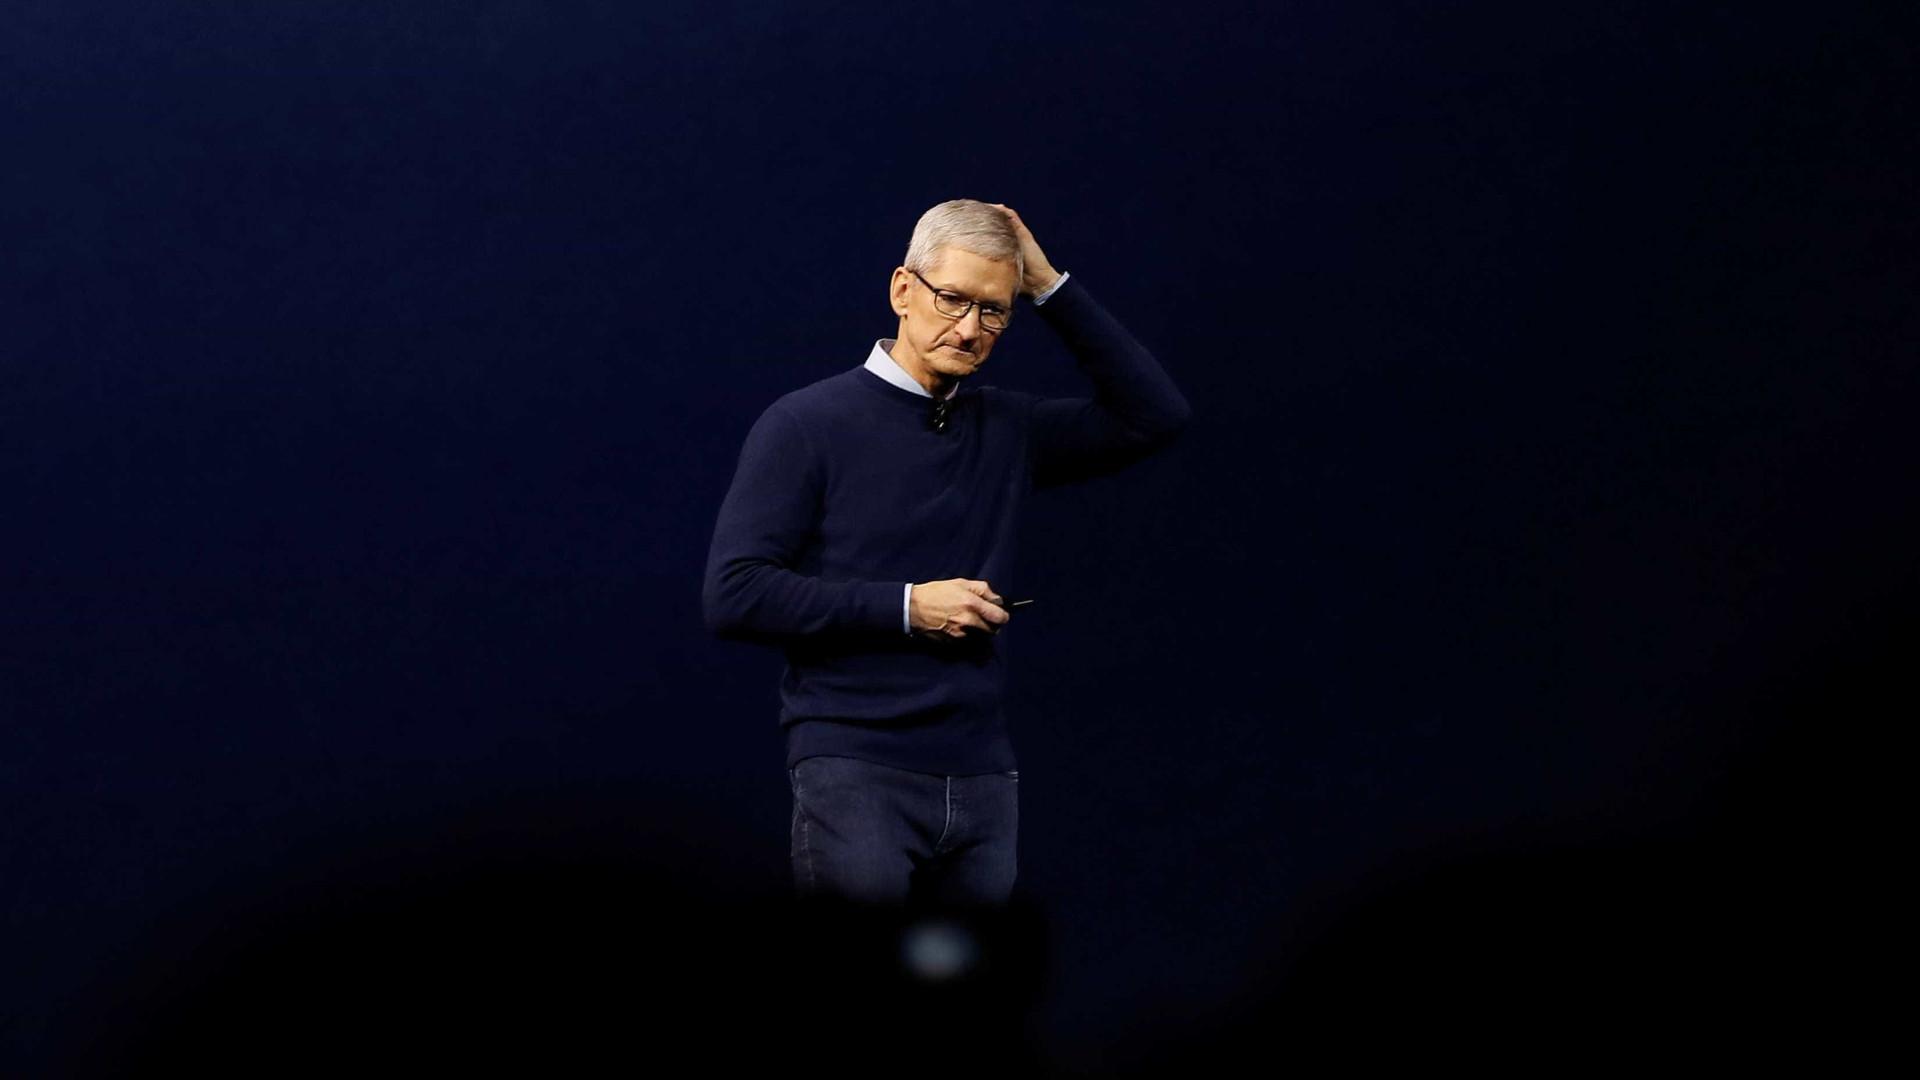 Polémica da Apple pode vir a beneficiar quem tem iPhone